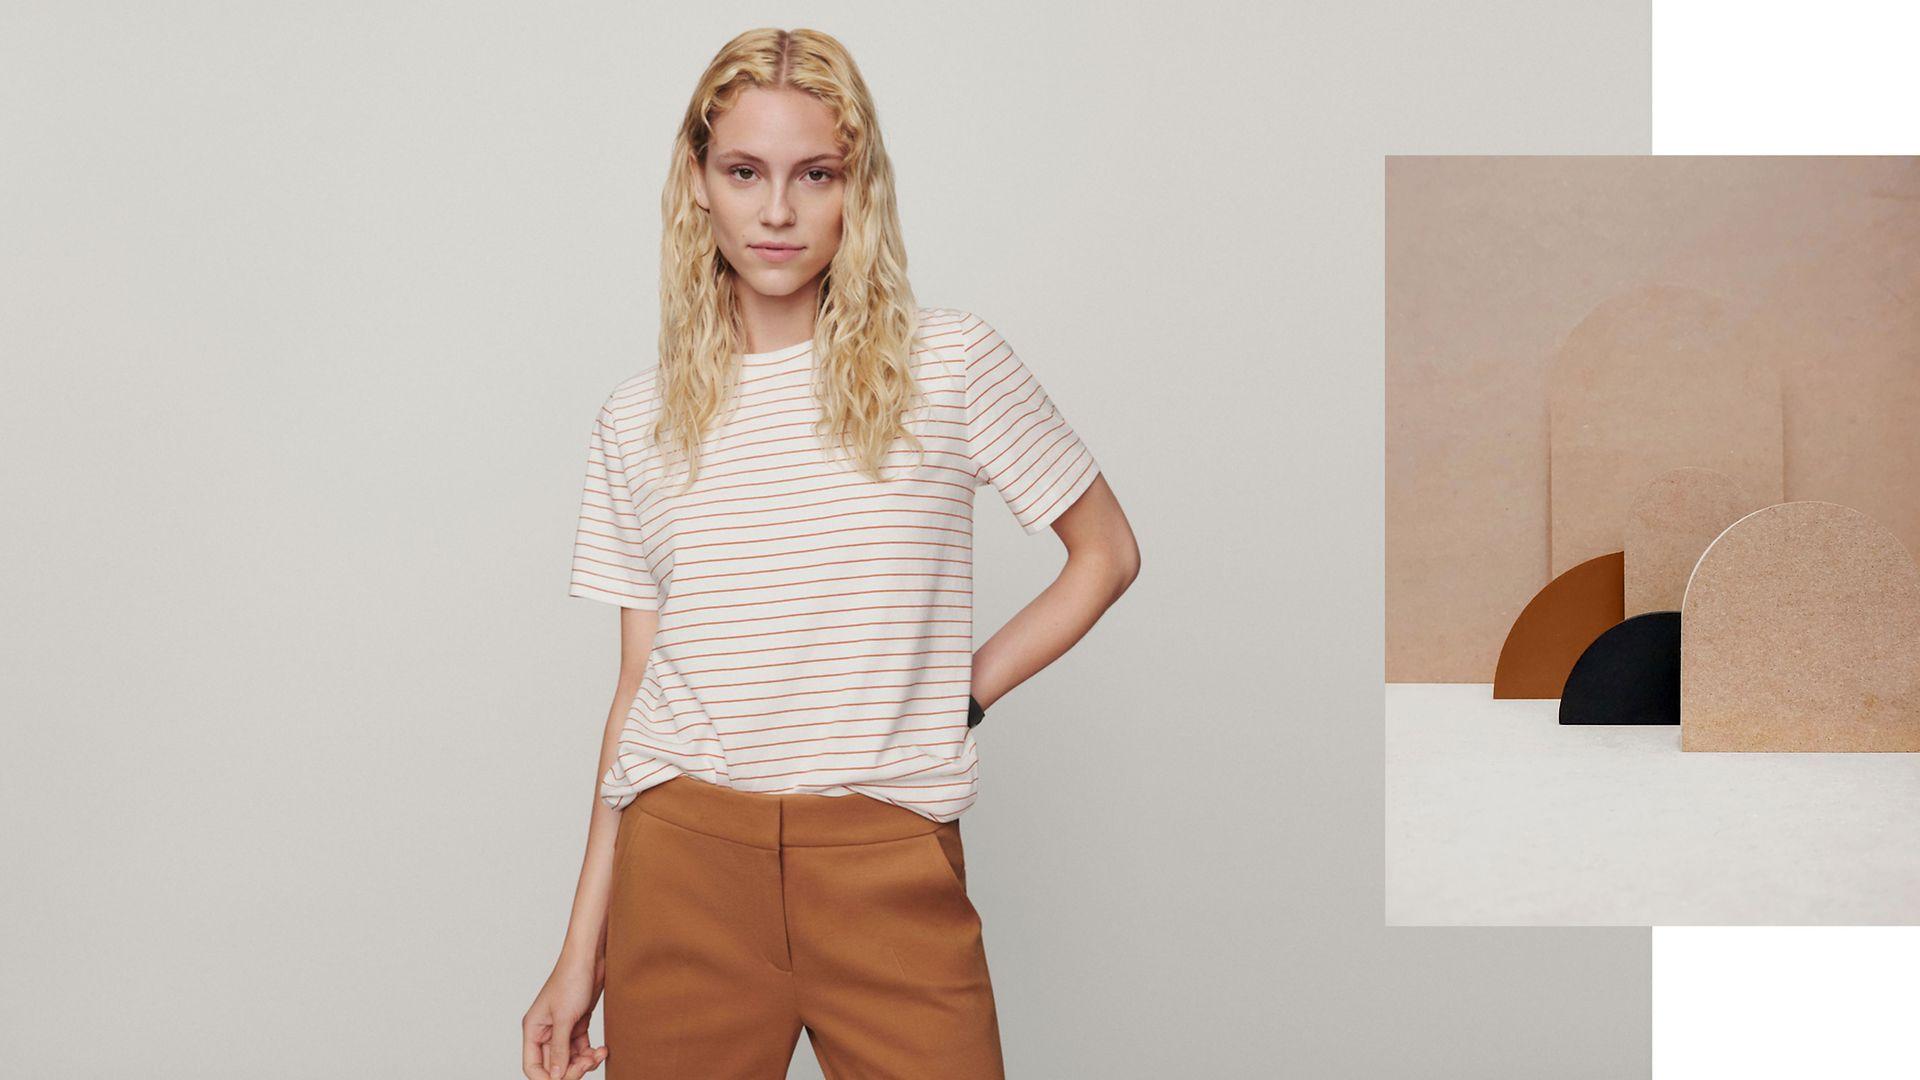 072021 - Women - Inspiration - Lookbook - Pantalons tout simplement idéals - Hero Large 2 IMG